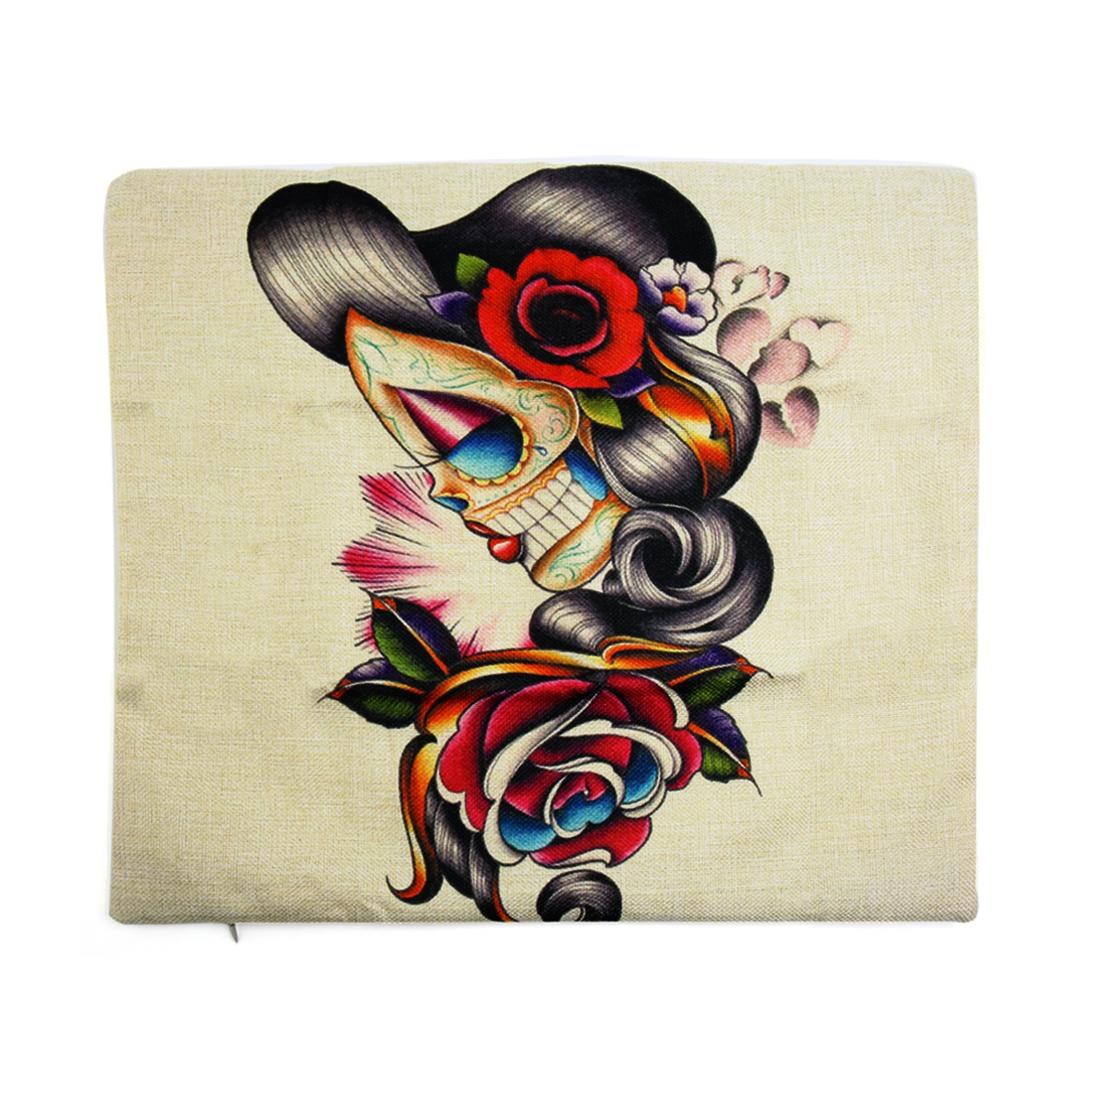 Square Linen Gothic Skull Printed Car Throw Cushion Pillow Cover Home Decor